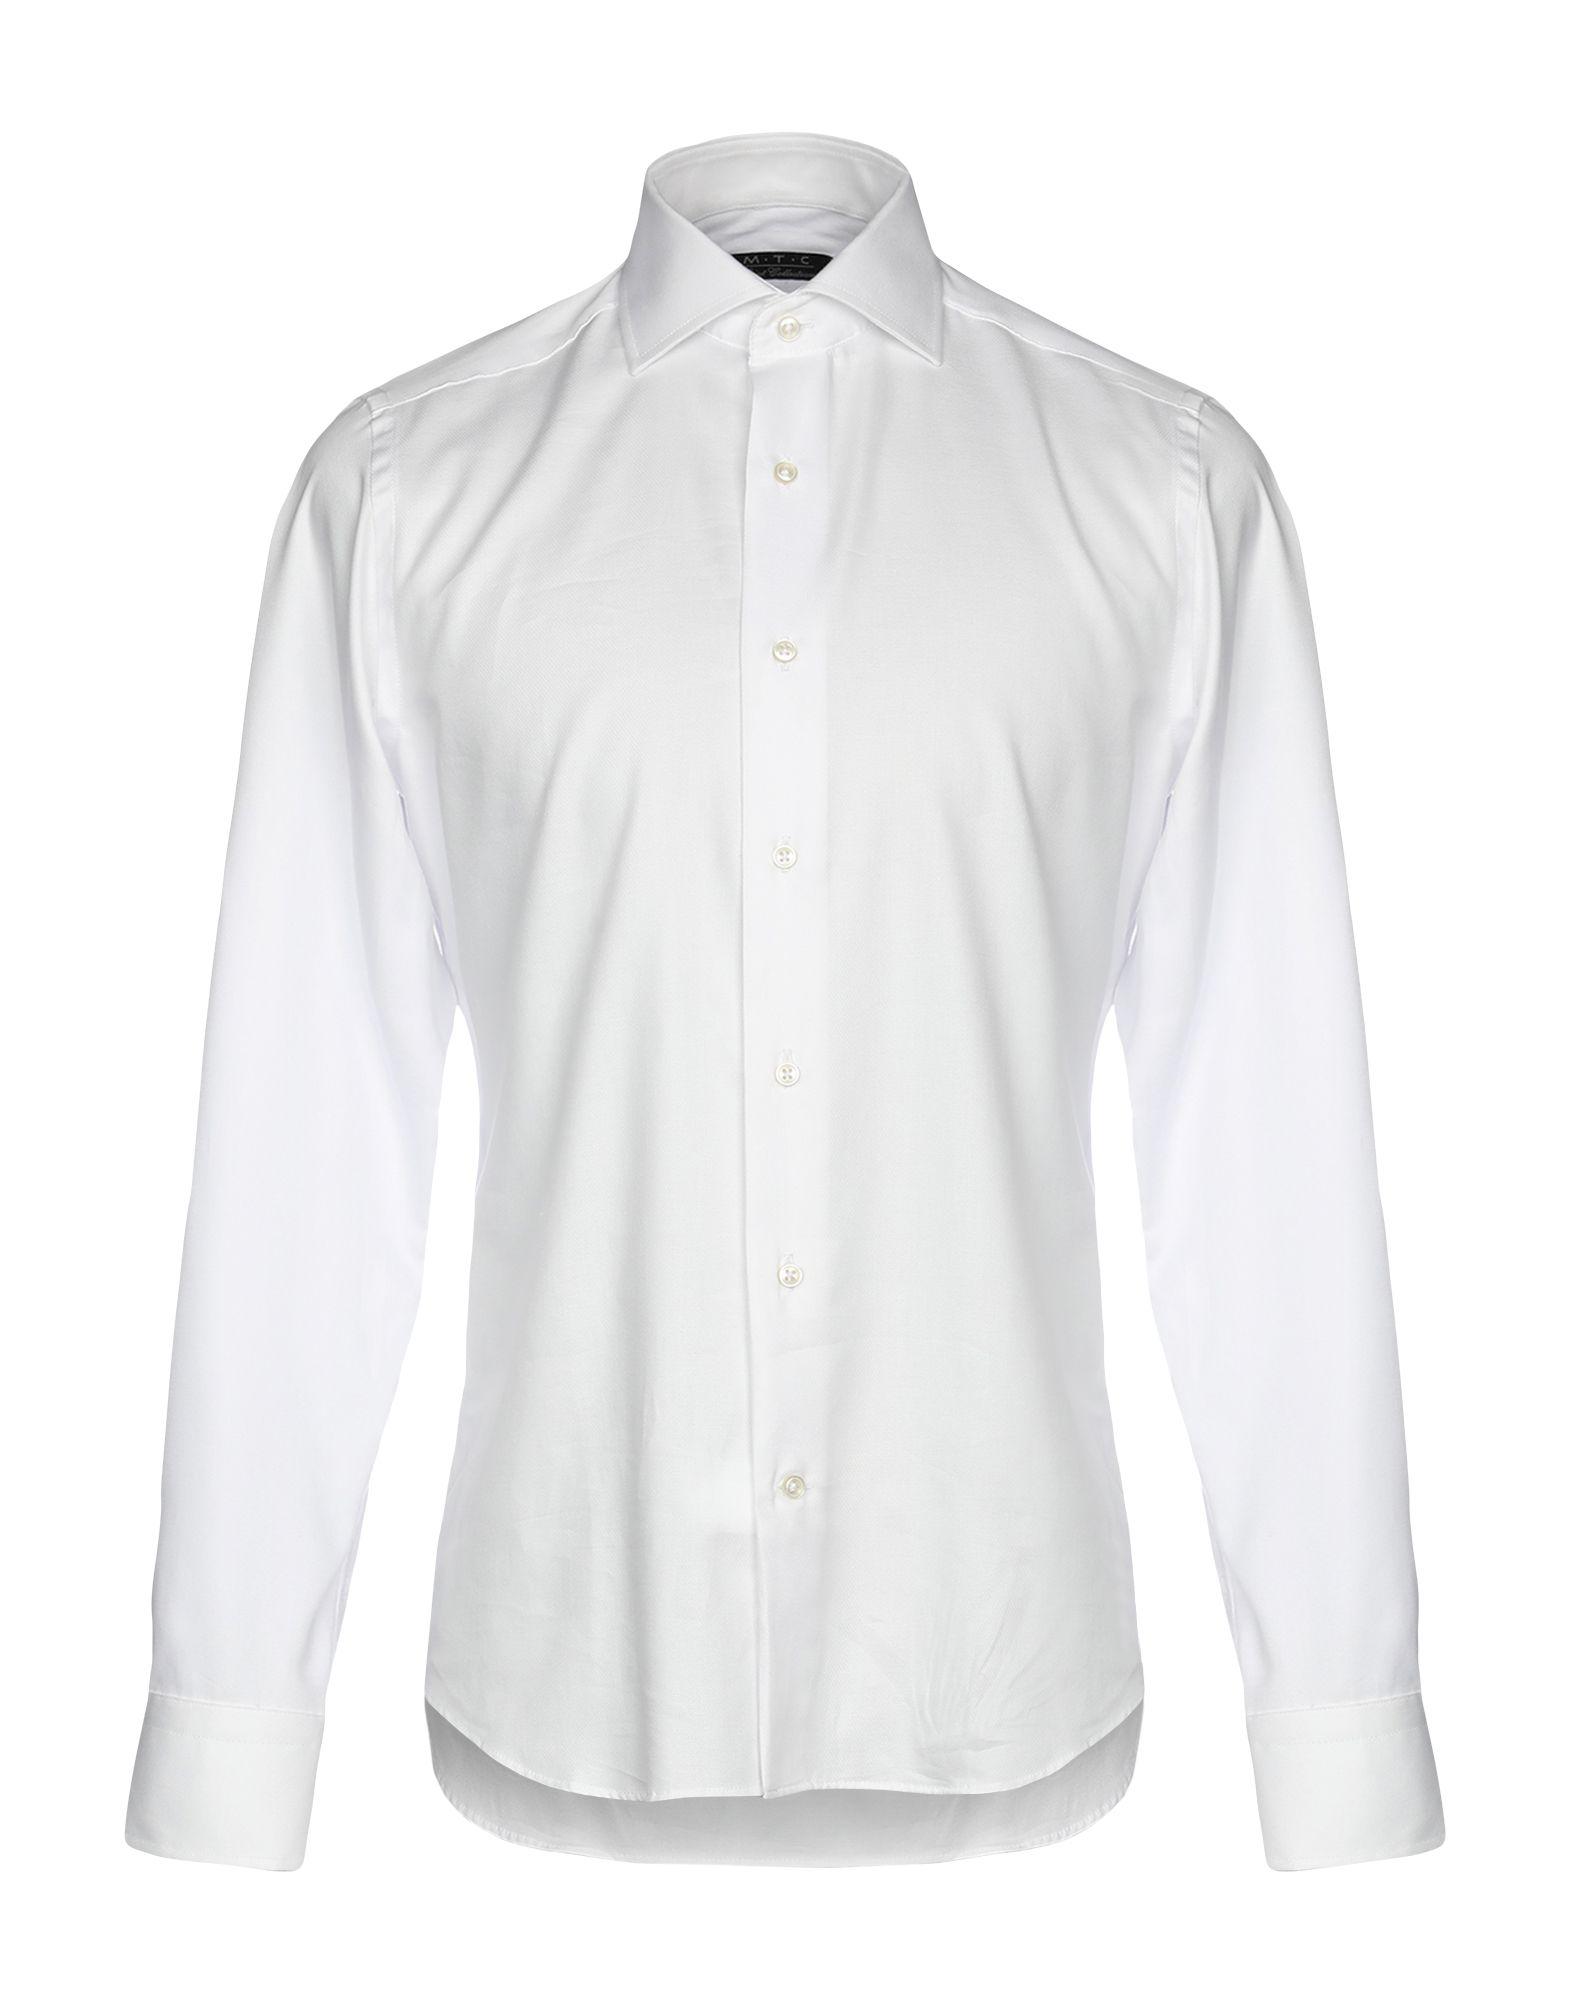 Фото - M.T.C SHIRT COLLECTION Pубашка j shirt pубашка